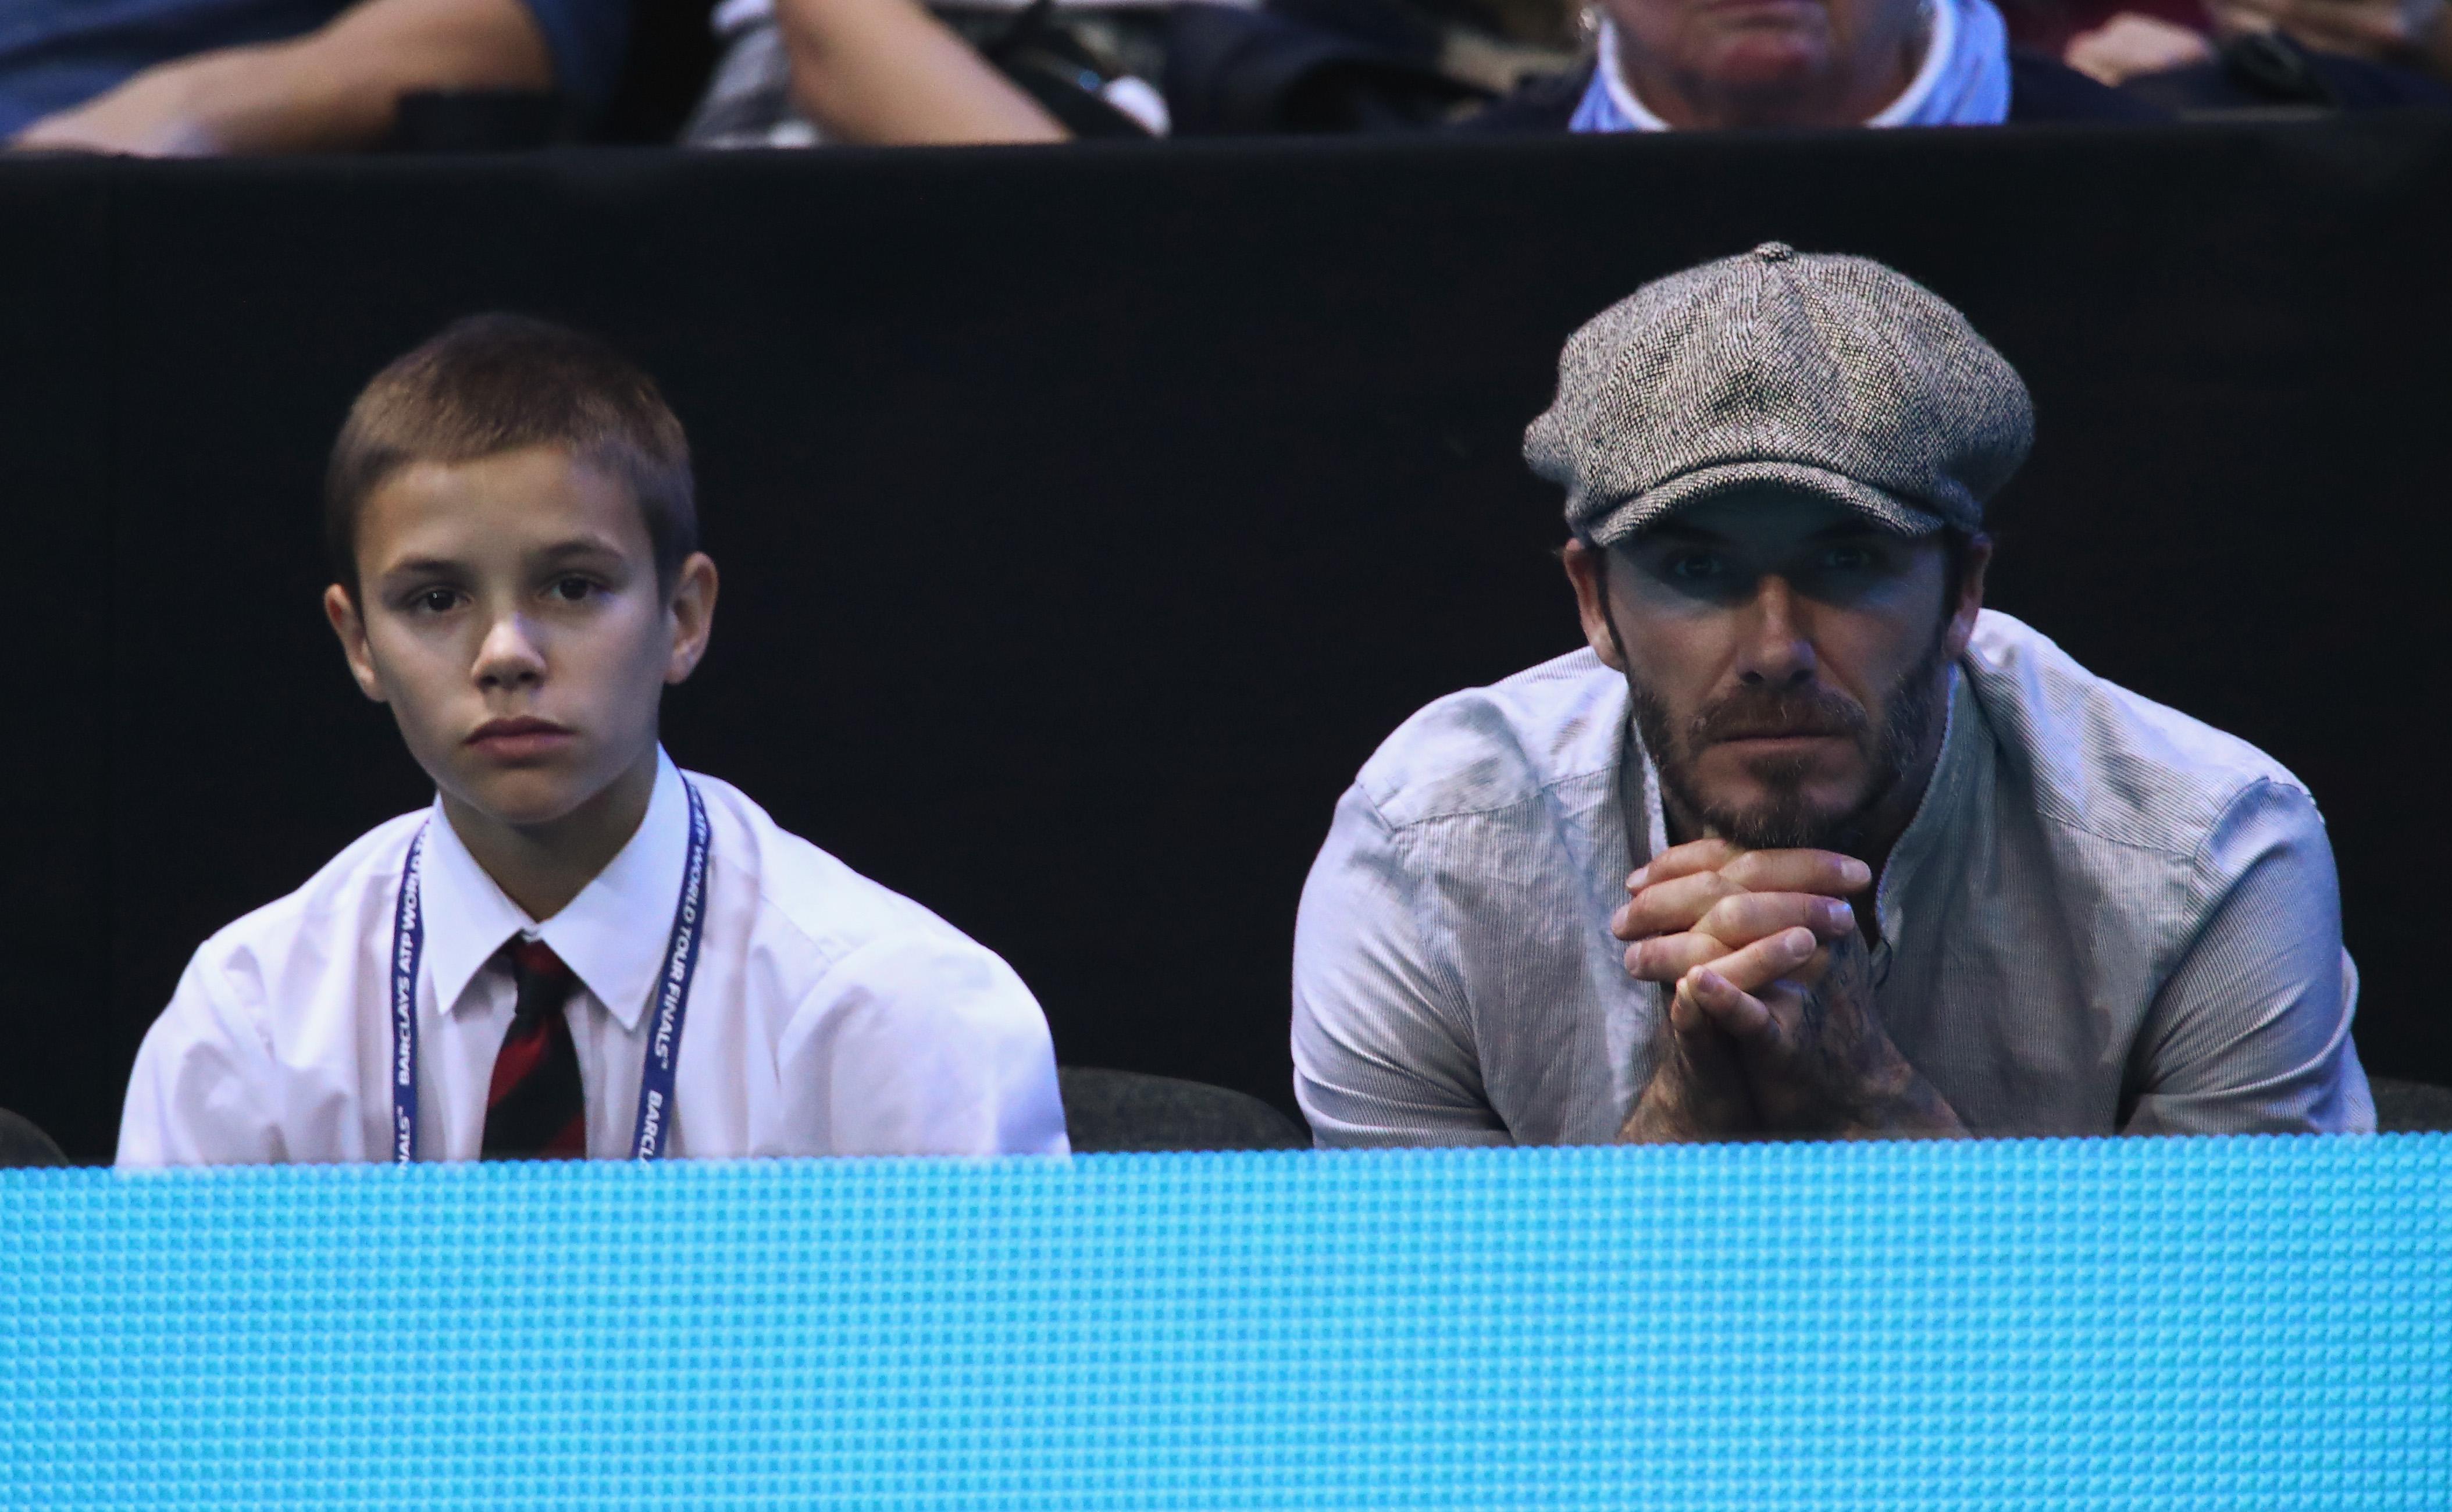 Day Five - Barclays ATP World Tour Finals